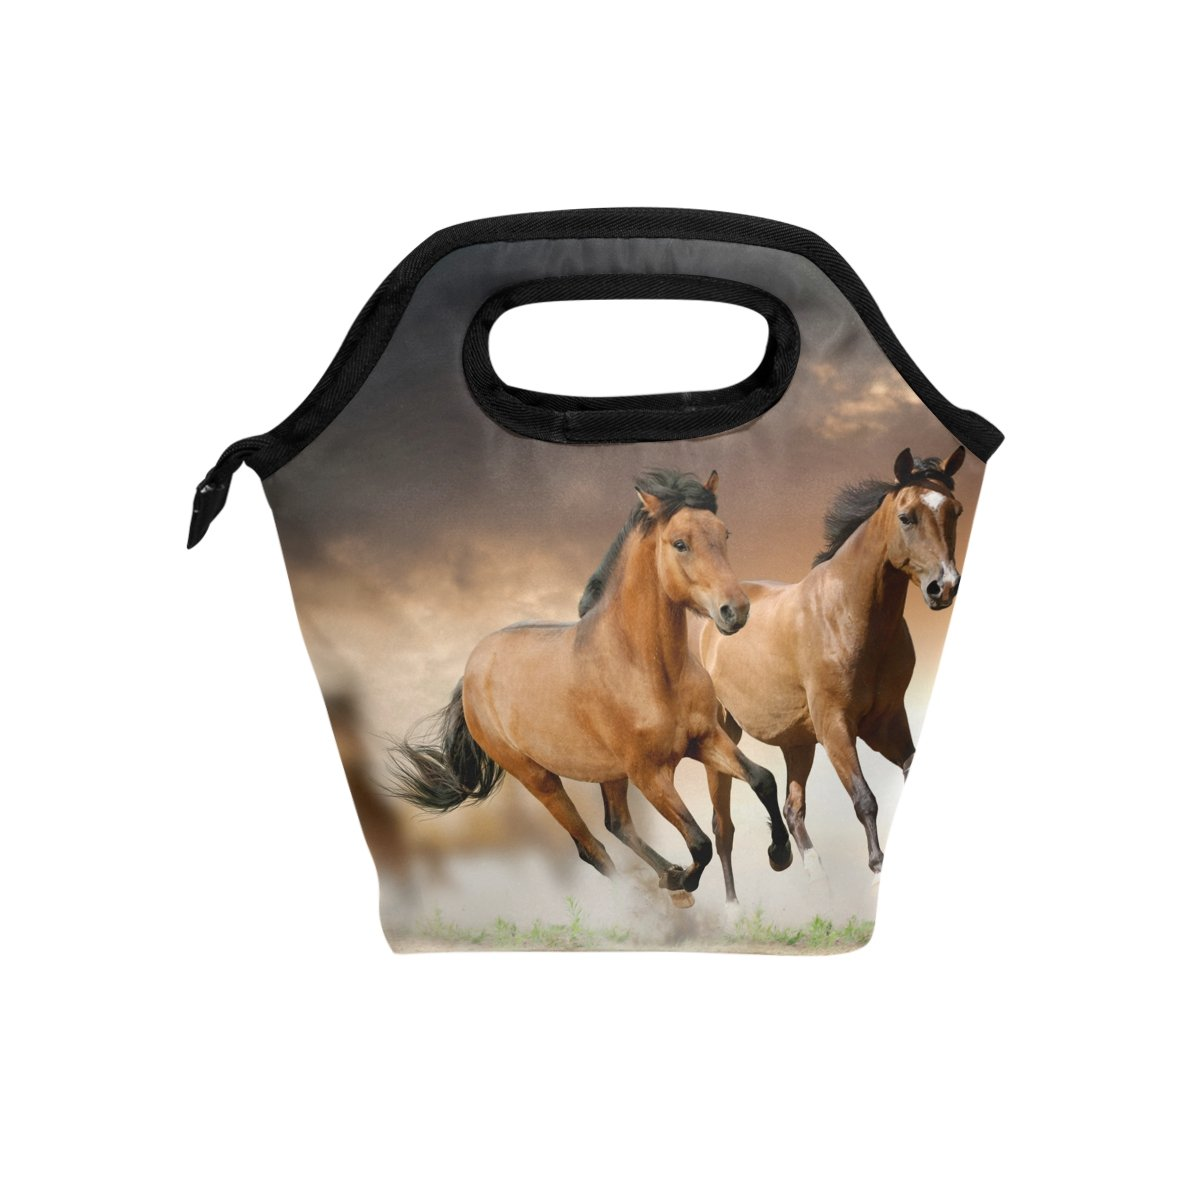 JSTEL - Bolsa de almuerzo para caballo africano, bolsa para el almuerzo, contenedor de alimentos, para viajes, picnic, escuela, oficina